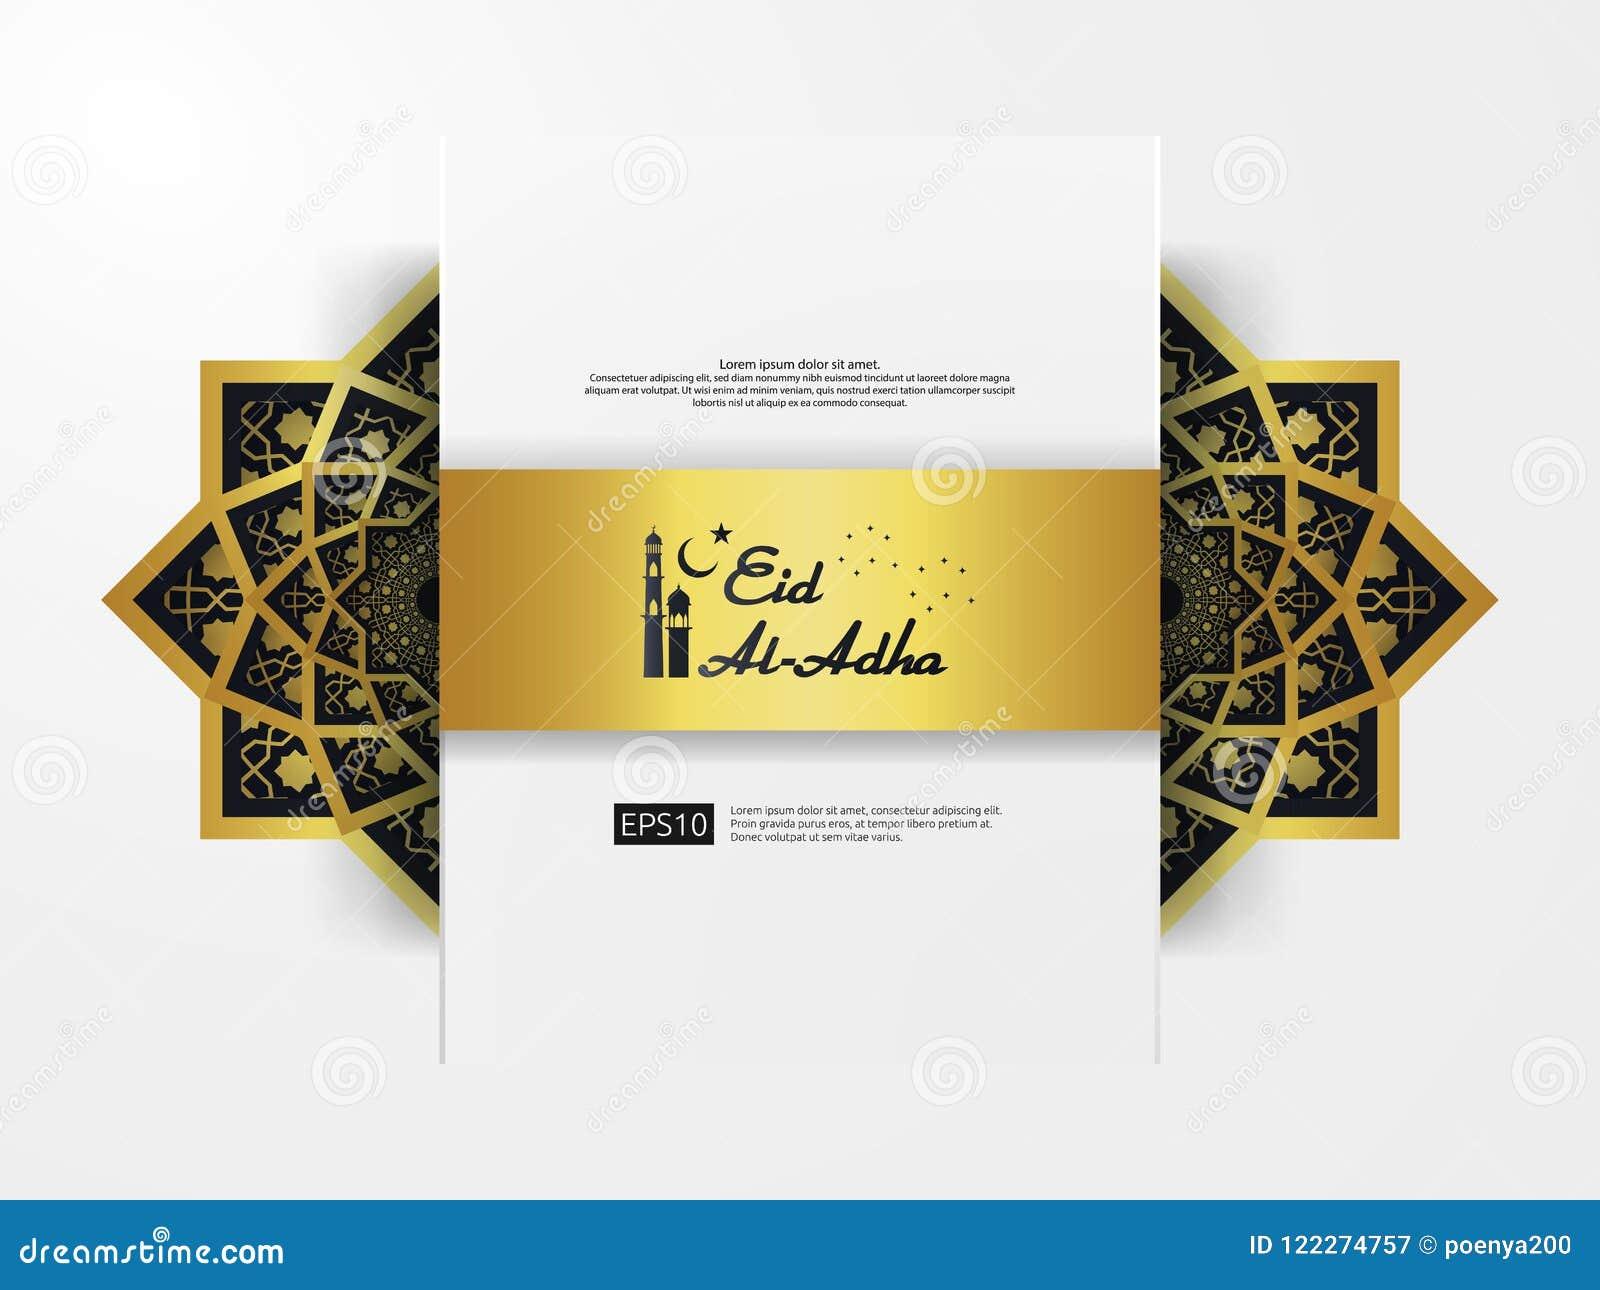 Eid Al Adha Mubarak Greeting Design Abstract Gold Color